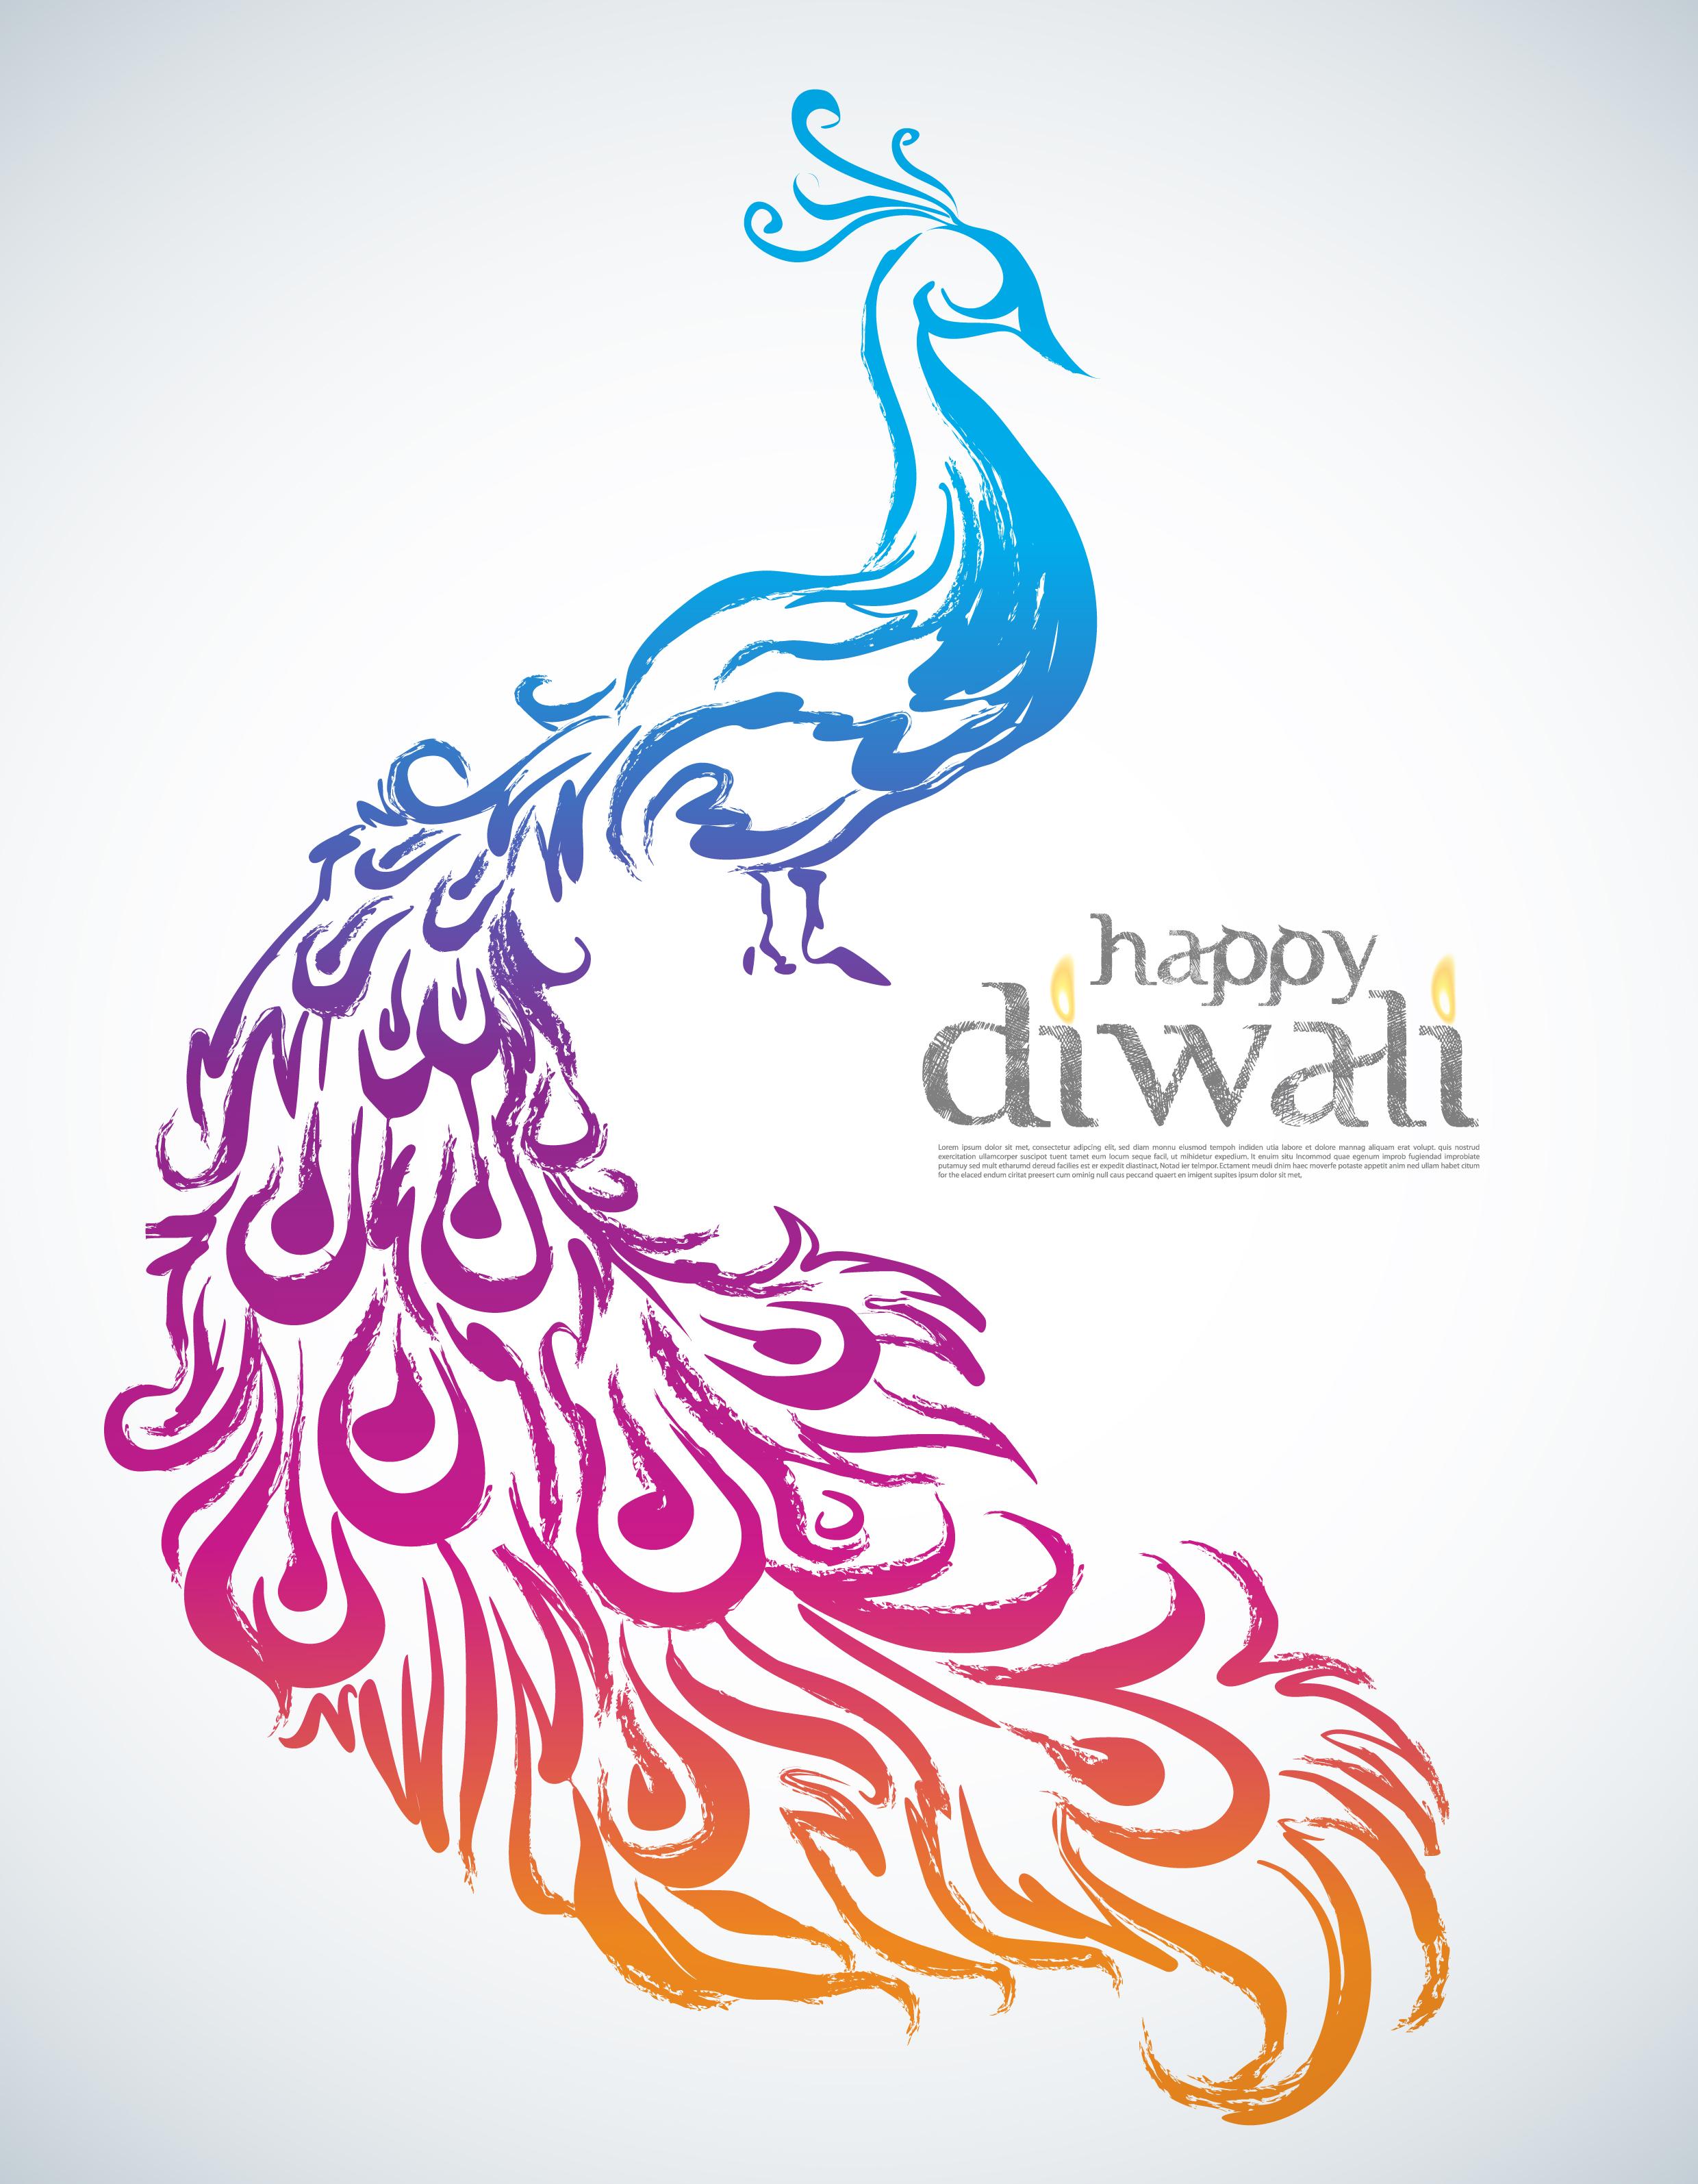 free-vector-diwali-background-01-vector_015073_shutterstock_85710206.jpg